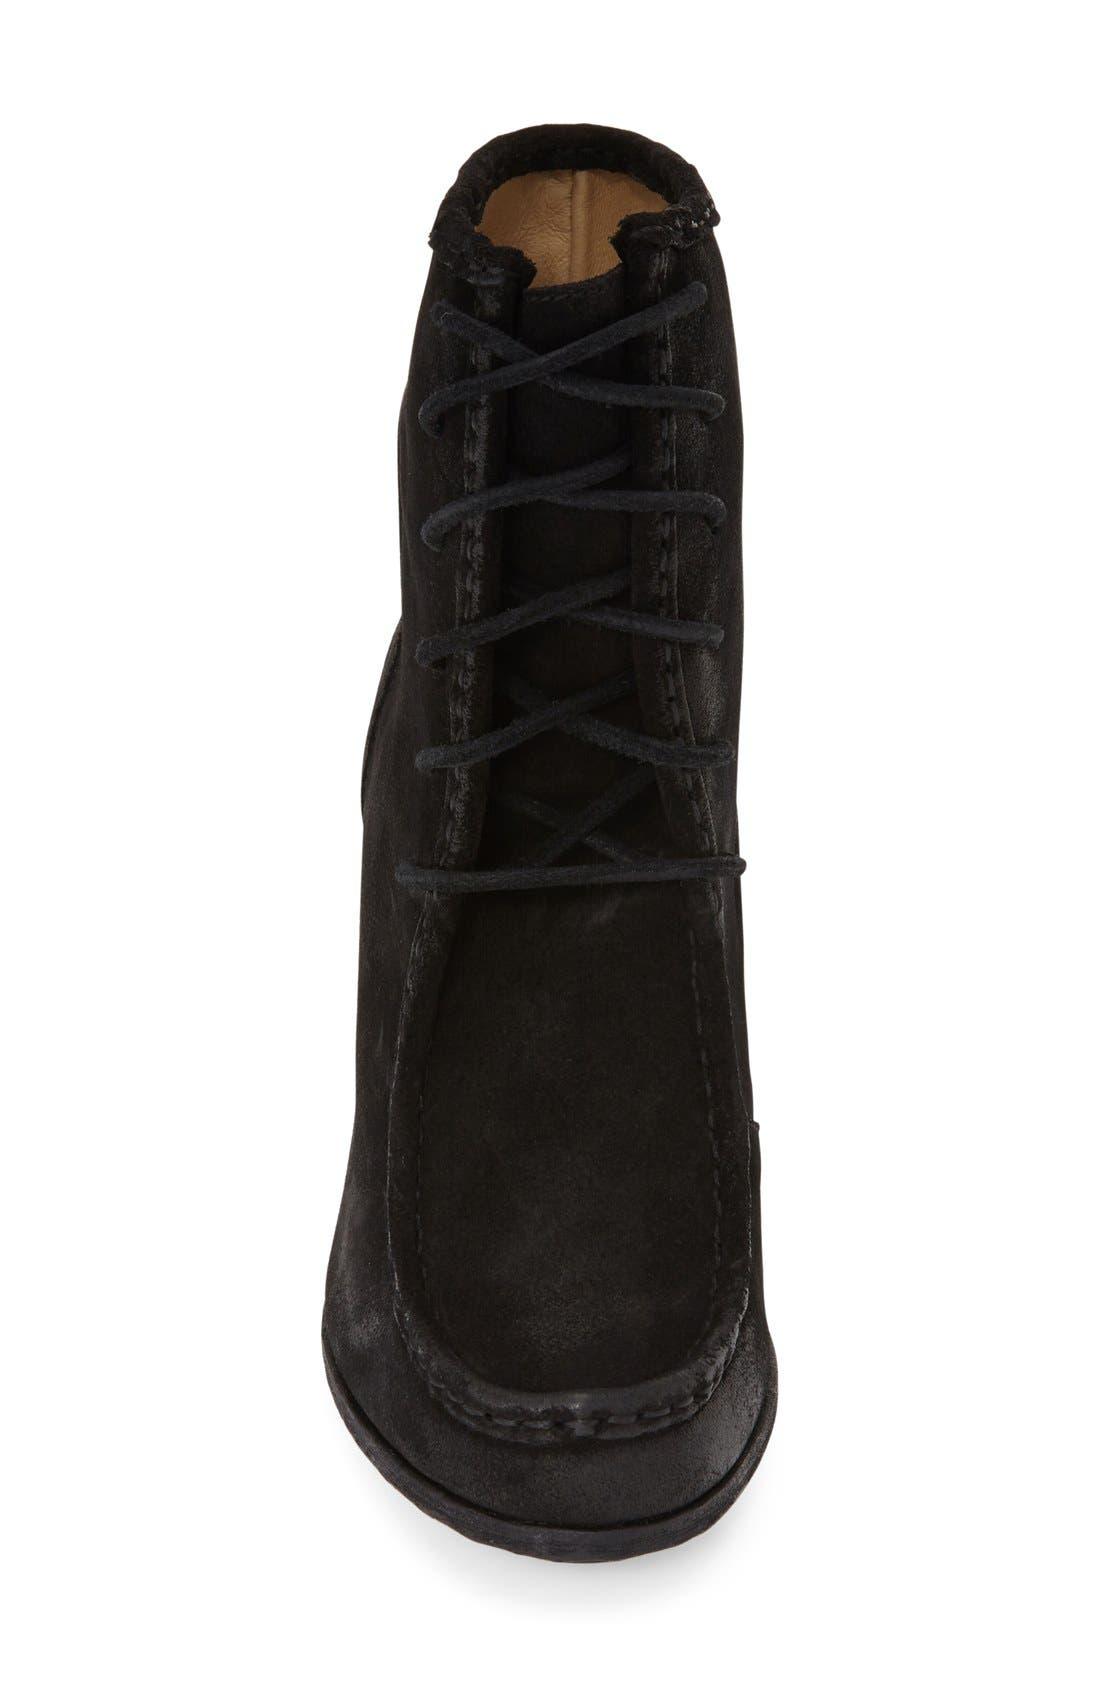 Alternate Image 3  - Frye 'Parker' Suede Moc Toe Ankle Boot (Women)